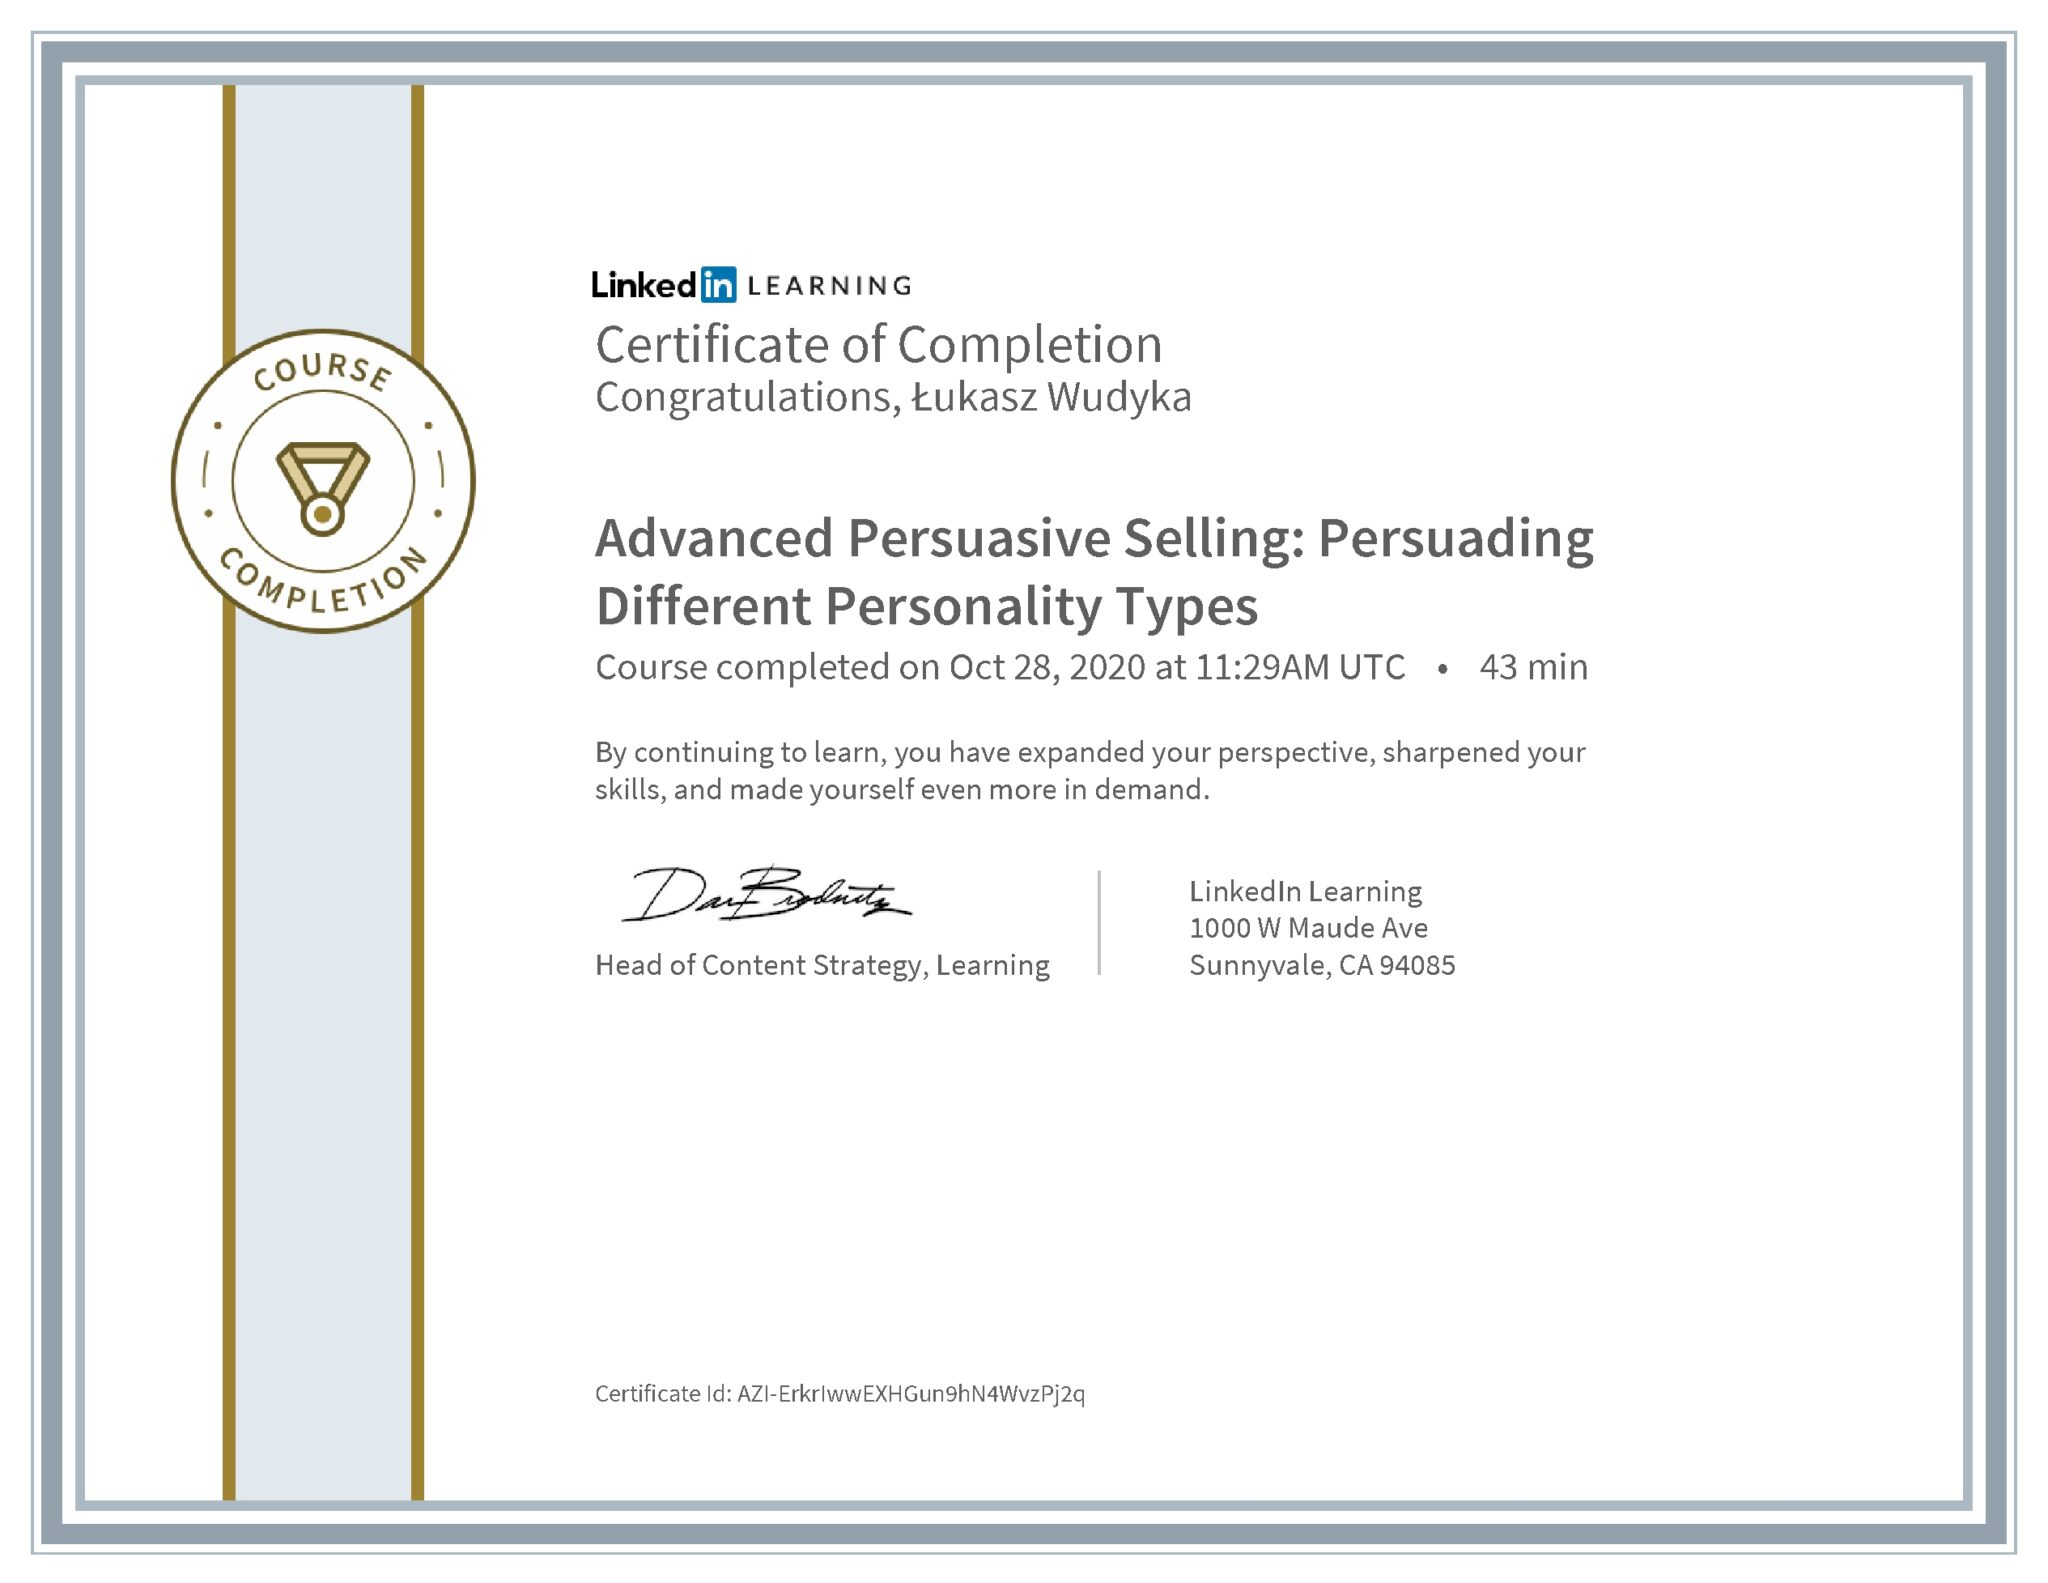 Łukasz Wudyka certyfikat LinkedIn Advanced Persuasive Selling: Persuading Different Personality Types